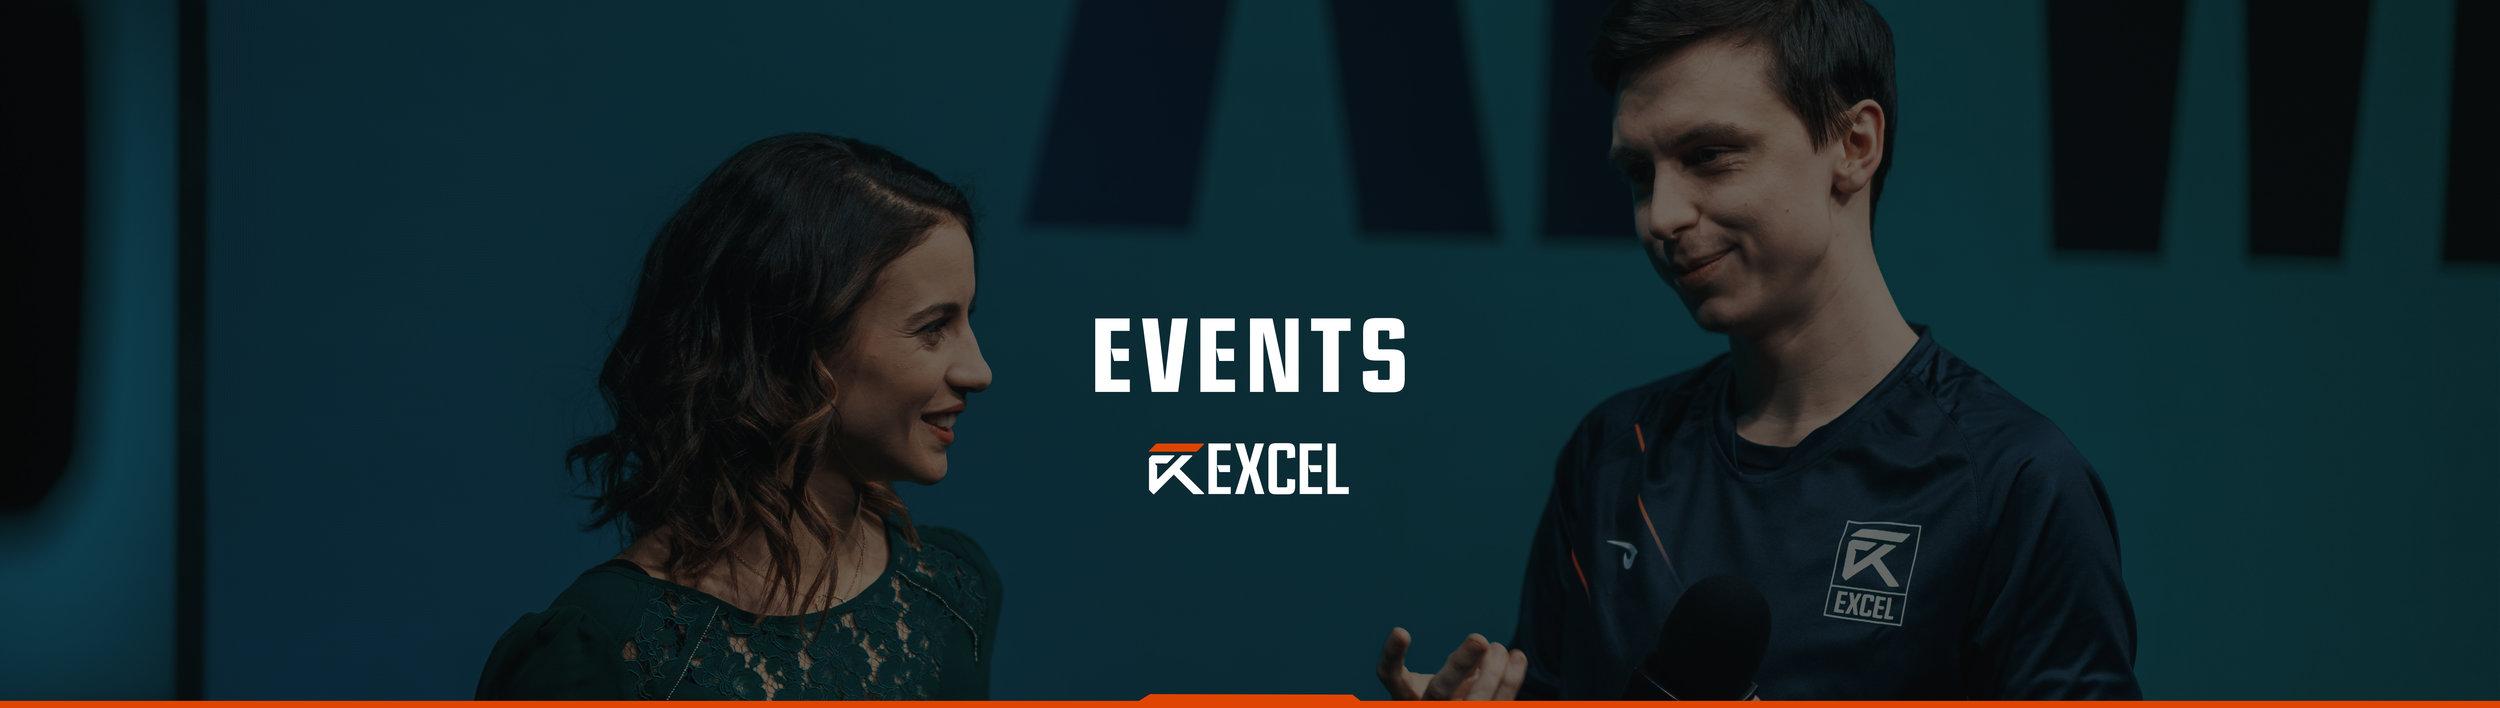 Eventss.jpg